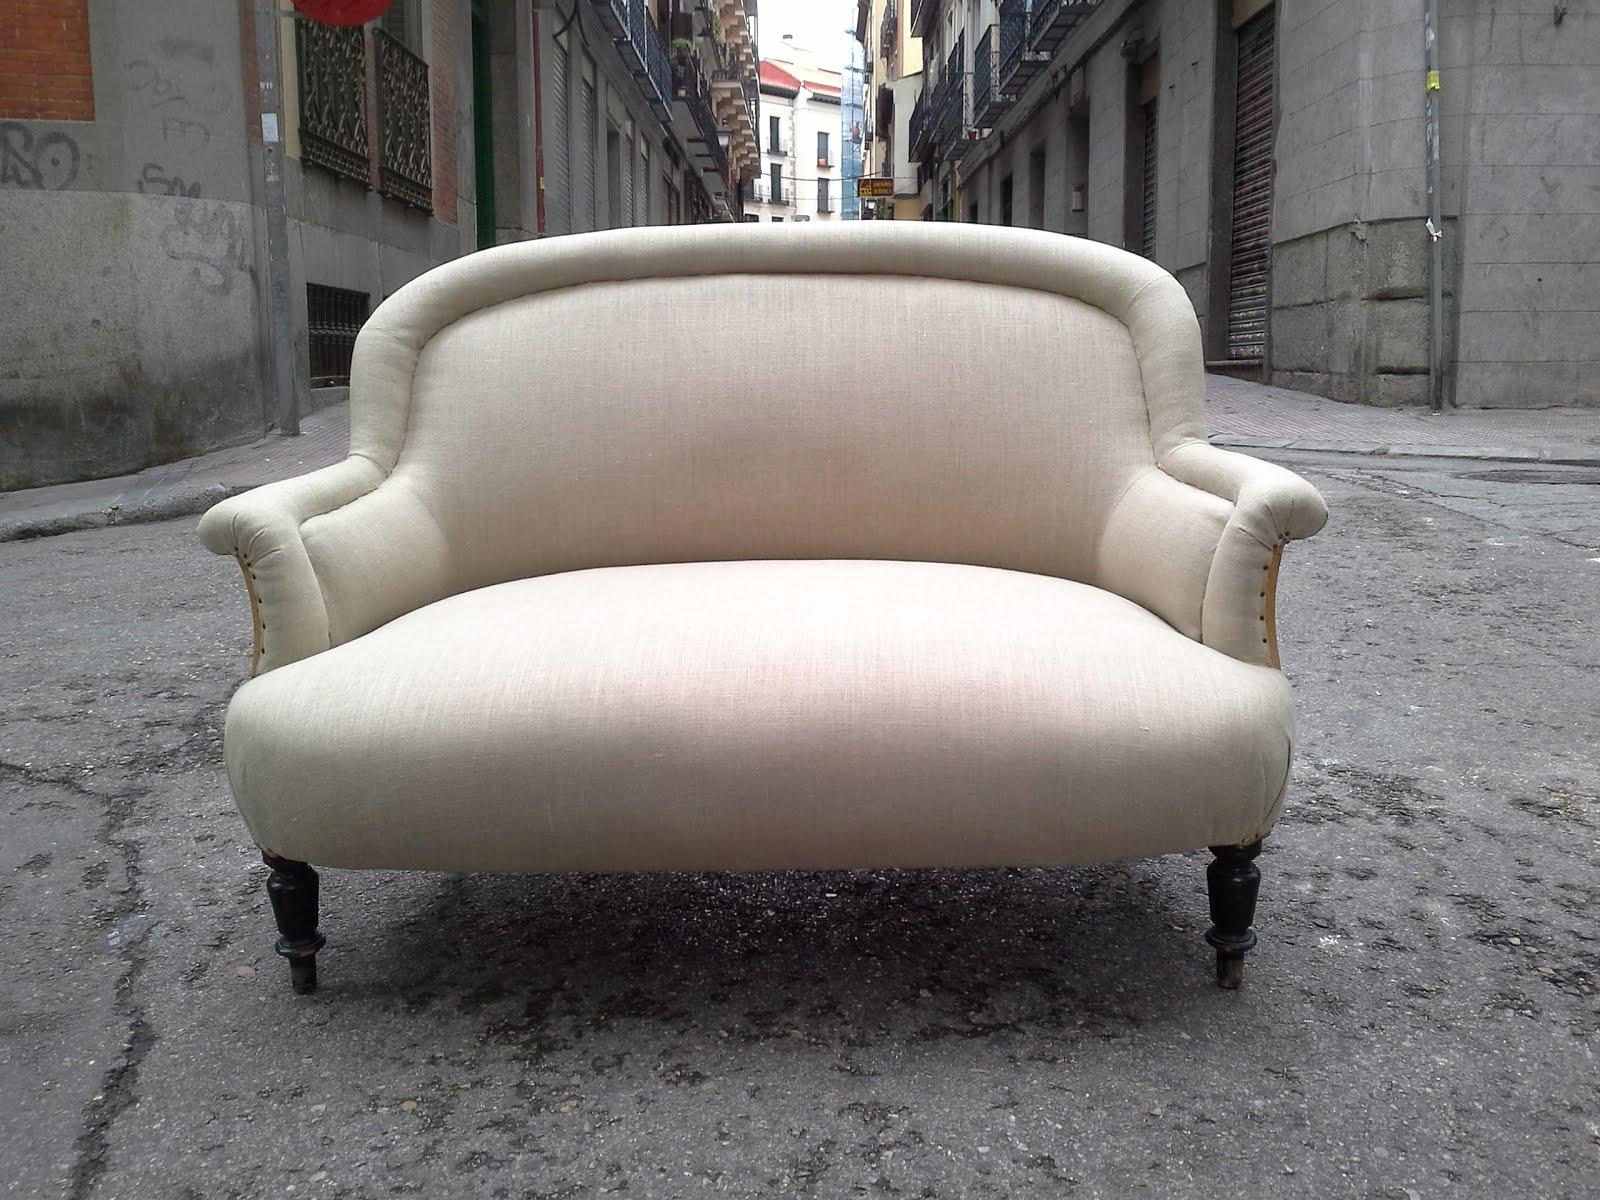 Sofa tapizado con armaz n a vista la tapicera - Sofas de 2 plazas ...